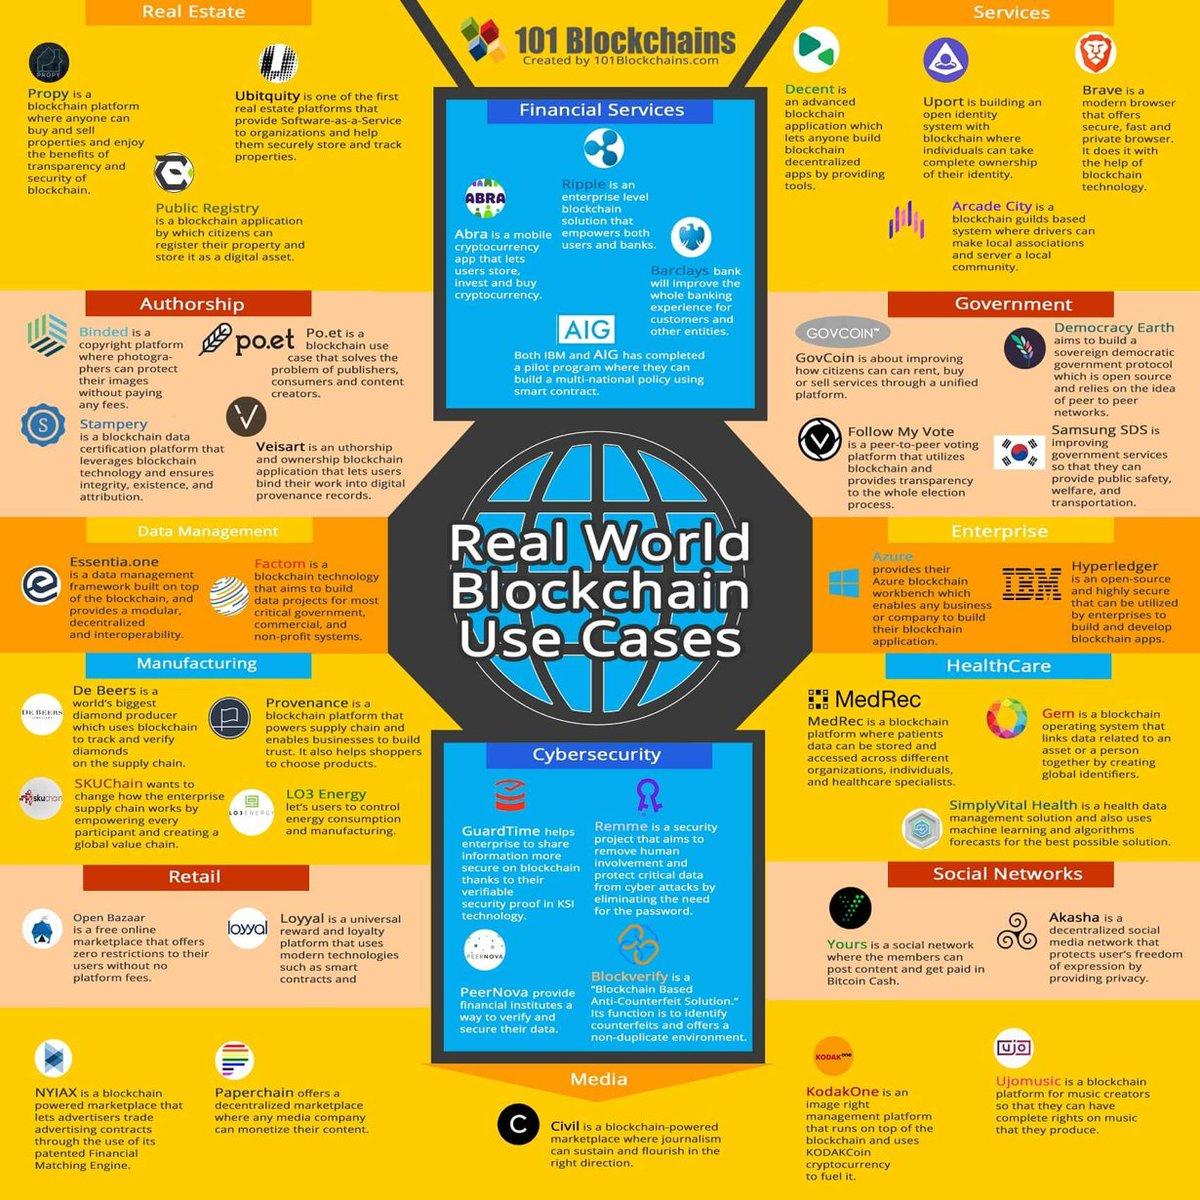 Real world #Blockchain use cases#InternetOfThings #Industry40 #ArtificialIntelligence #MachineLearning #DeepLearning #DataScience #DataMining #BigData #Analytics #Cloud #Business #Marketing #usecase